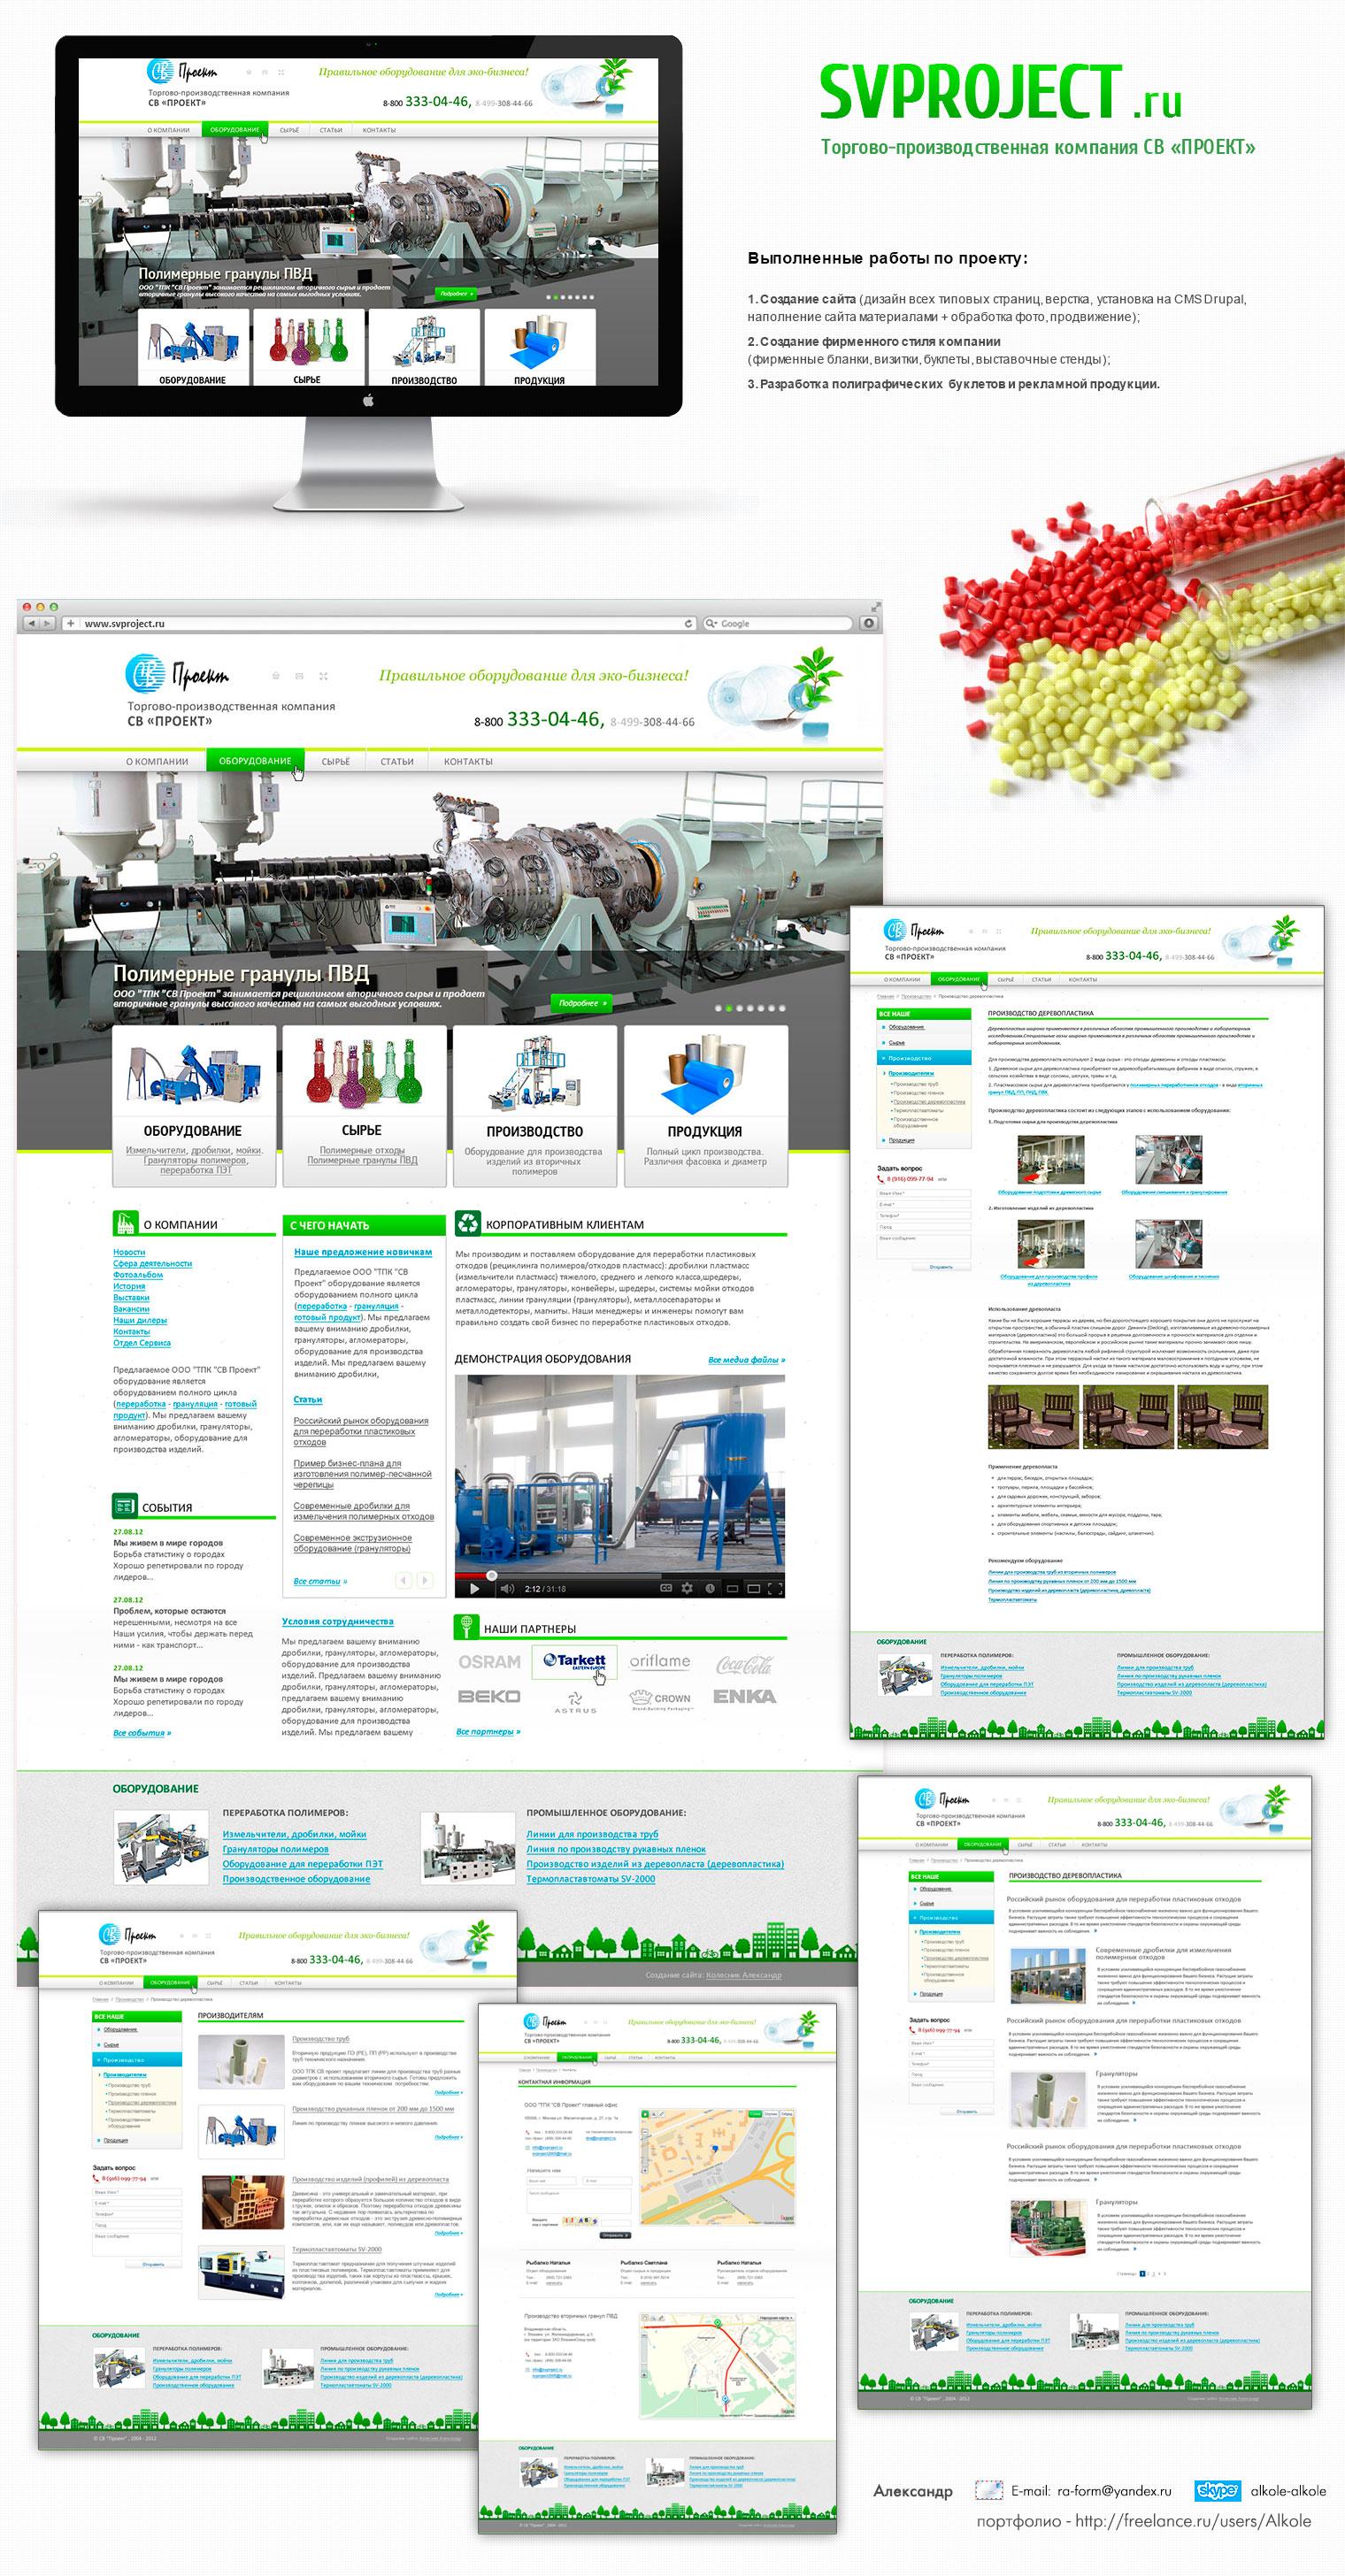 Корпоративный сайт компании СВ «ПРОЕКТ»